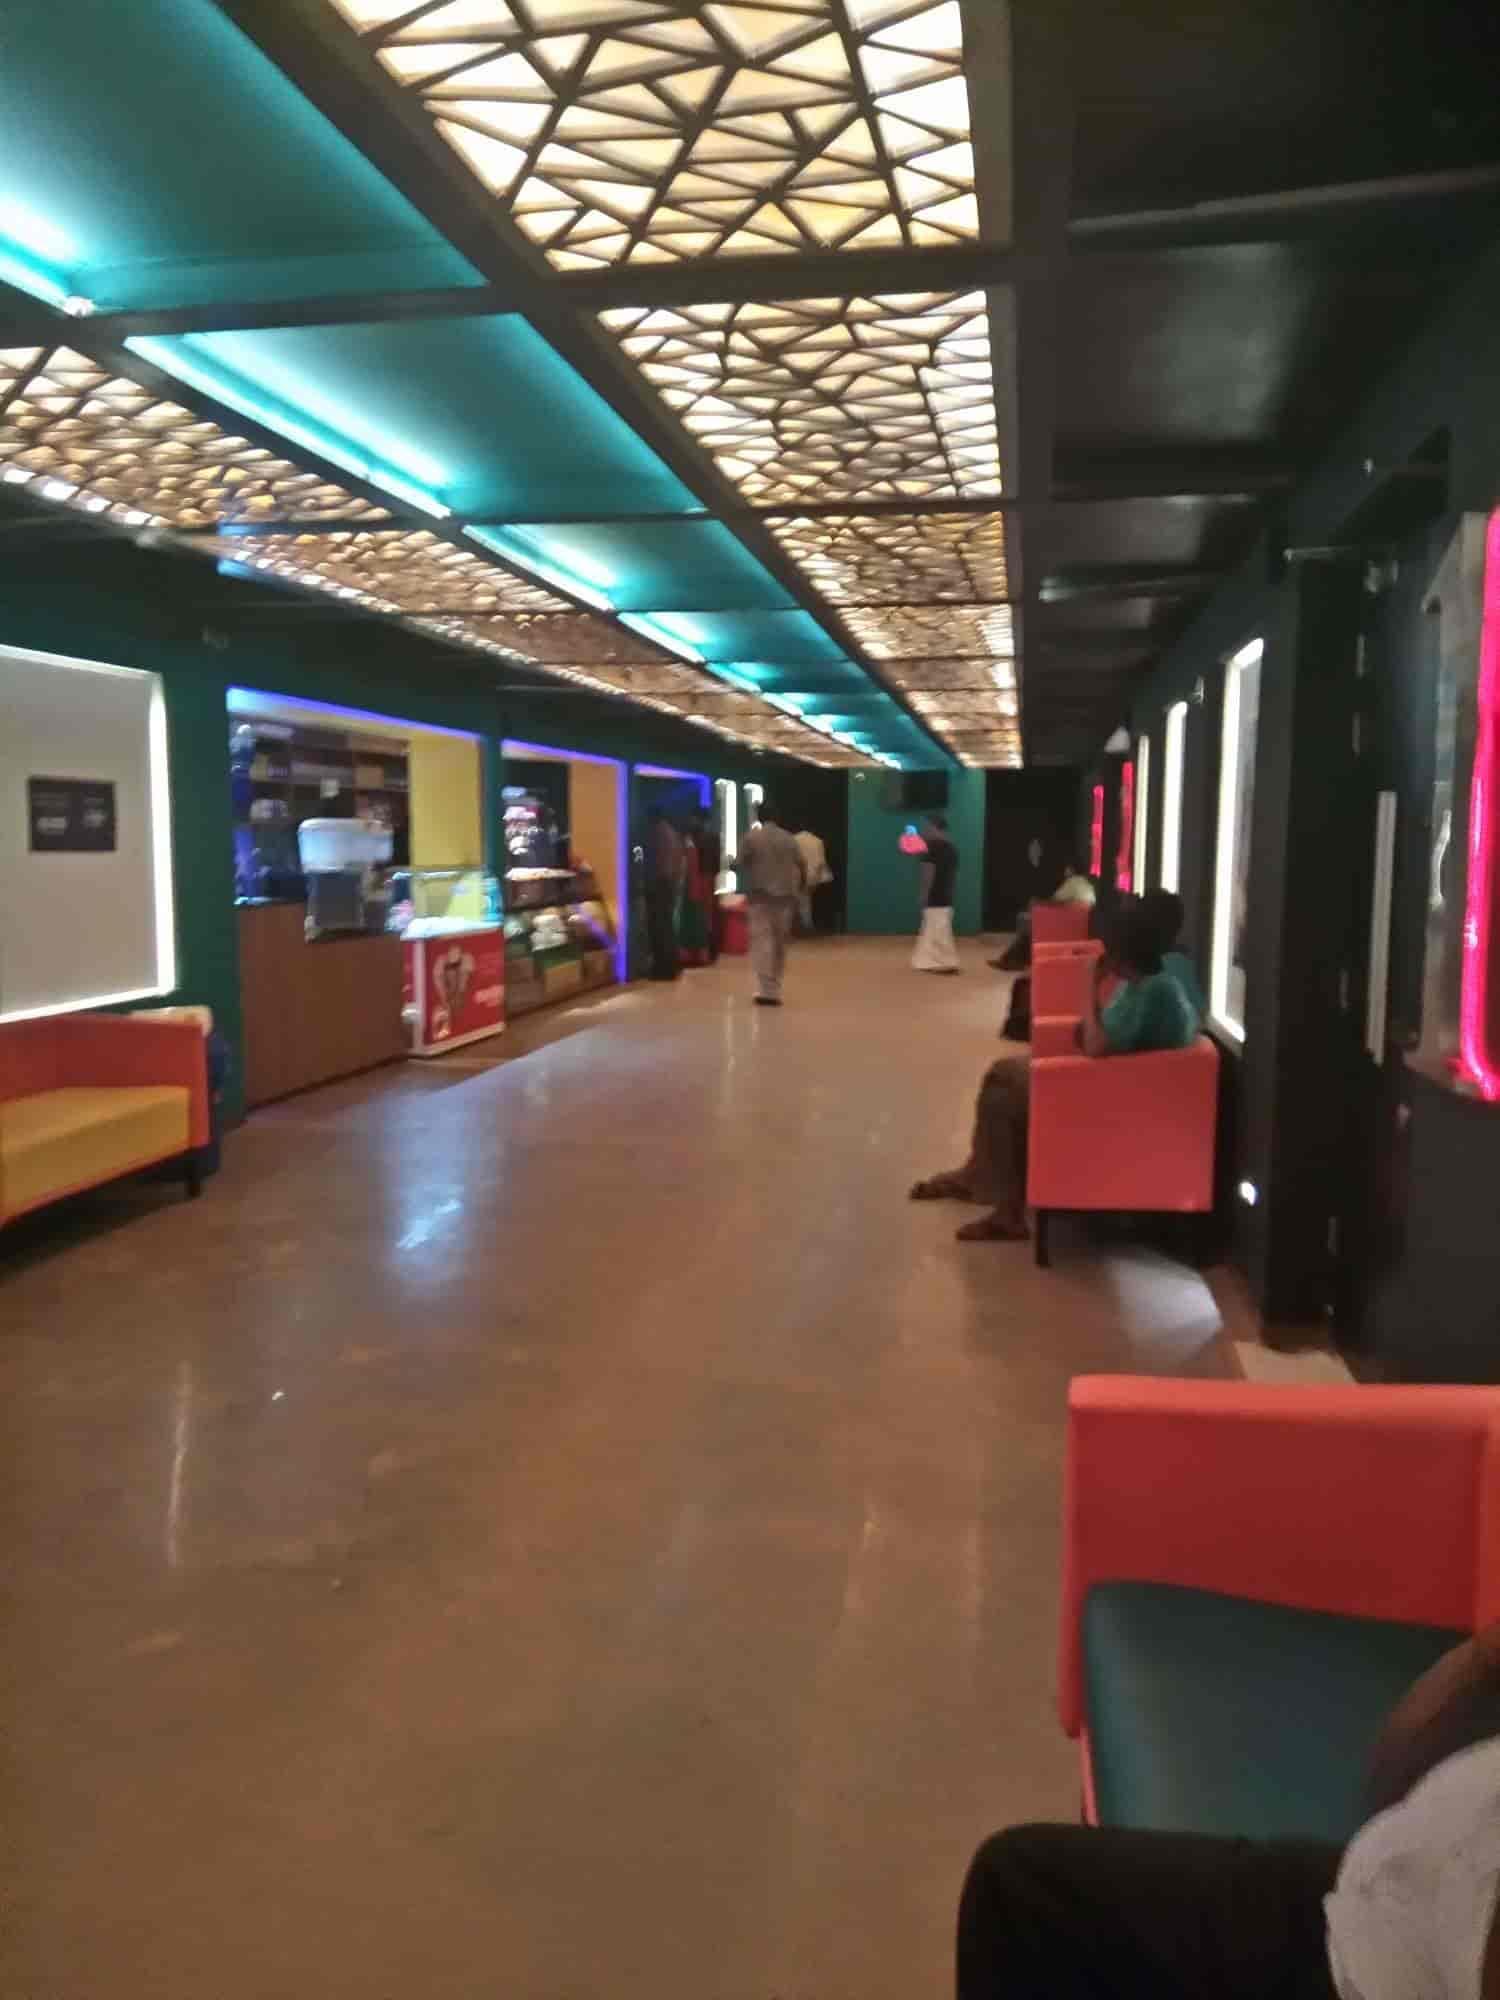 Regal Theatre, East Hill - Multiplex Cinema Halls in Kozhikode